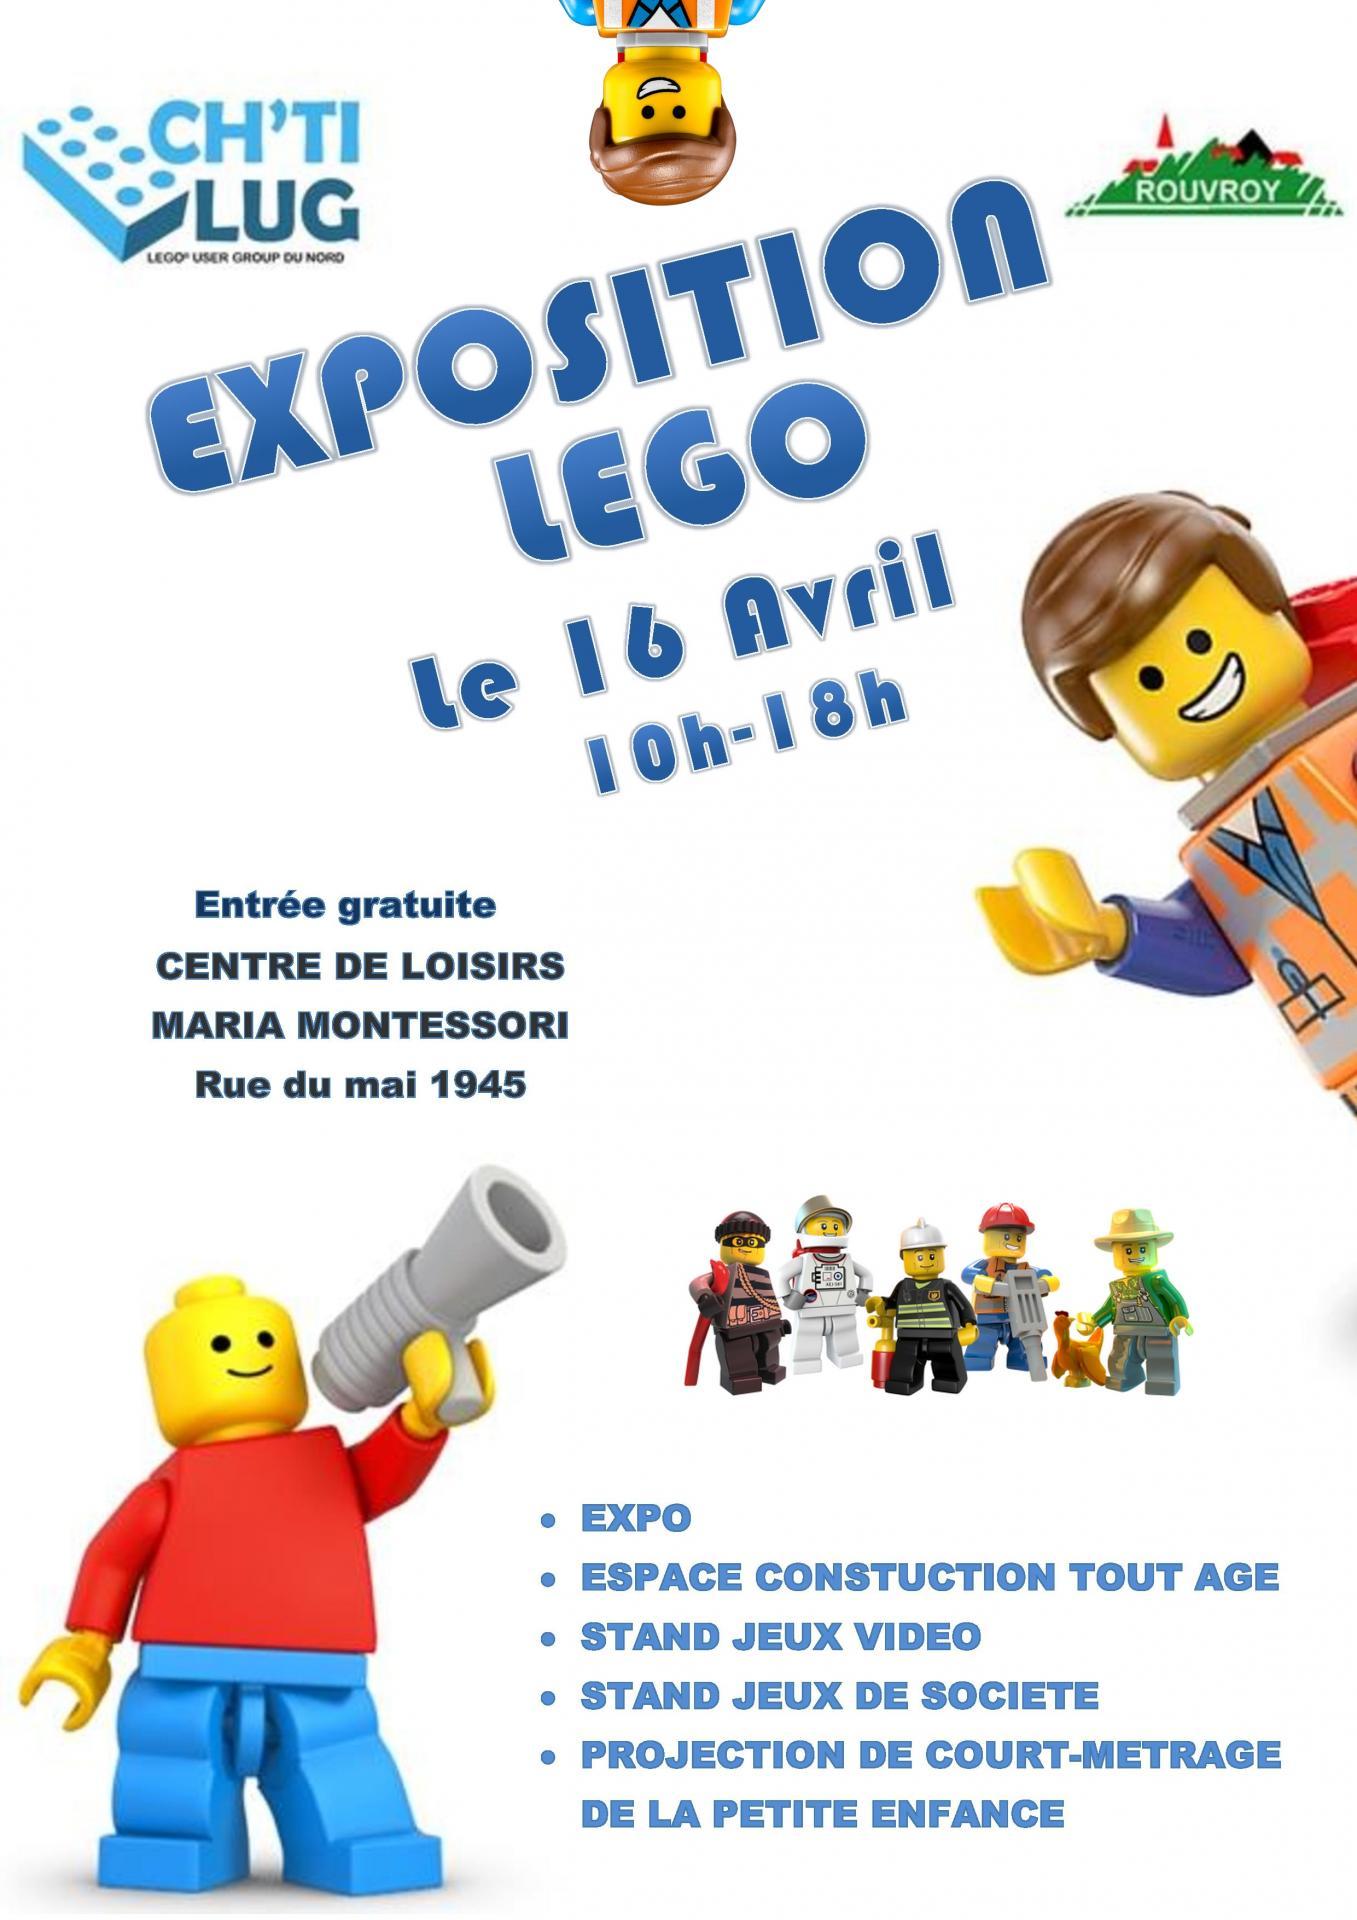 Affiche lego rouvroy